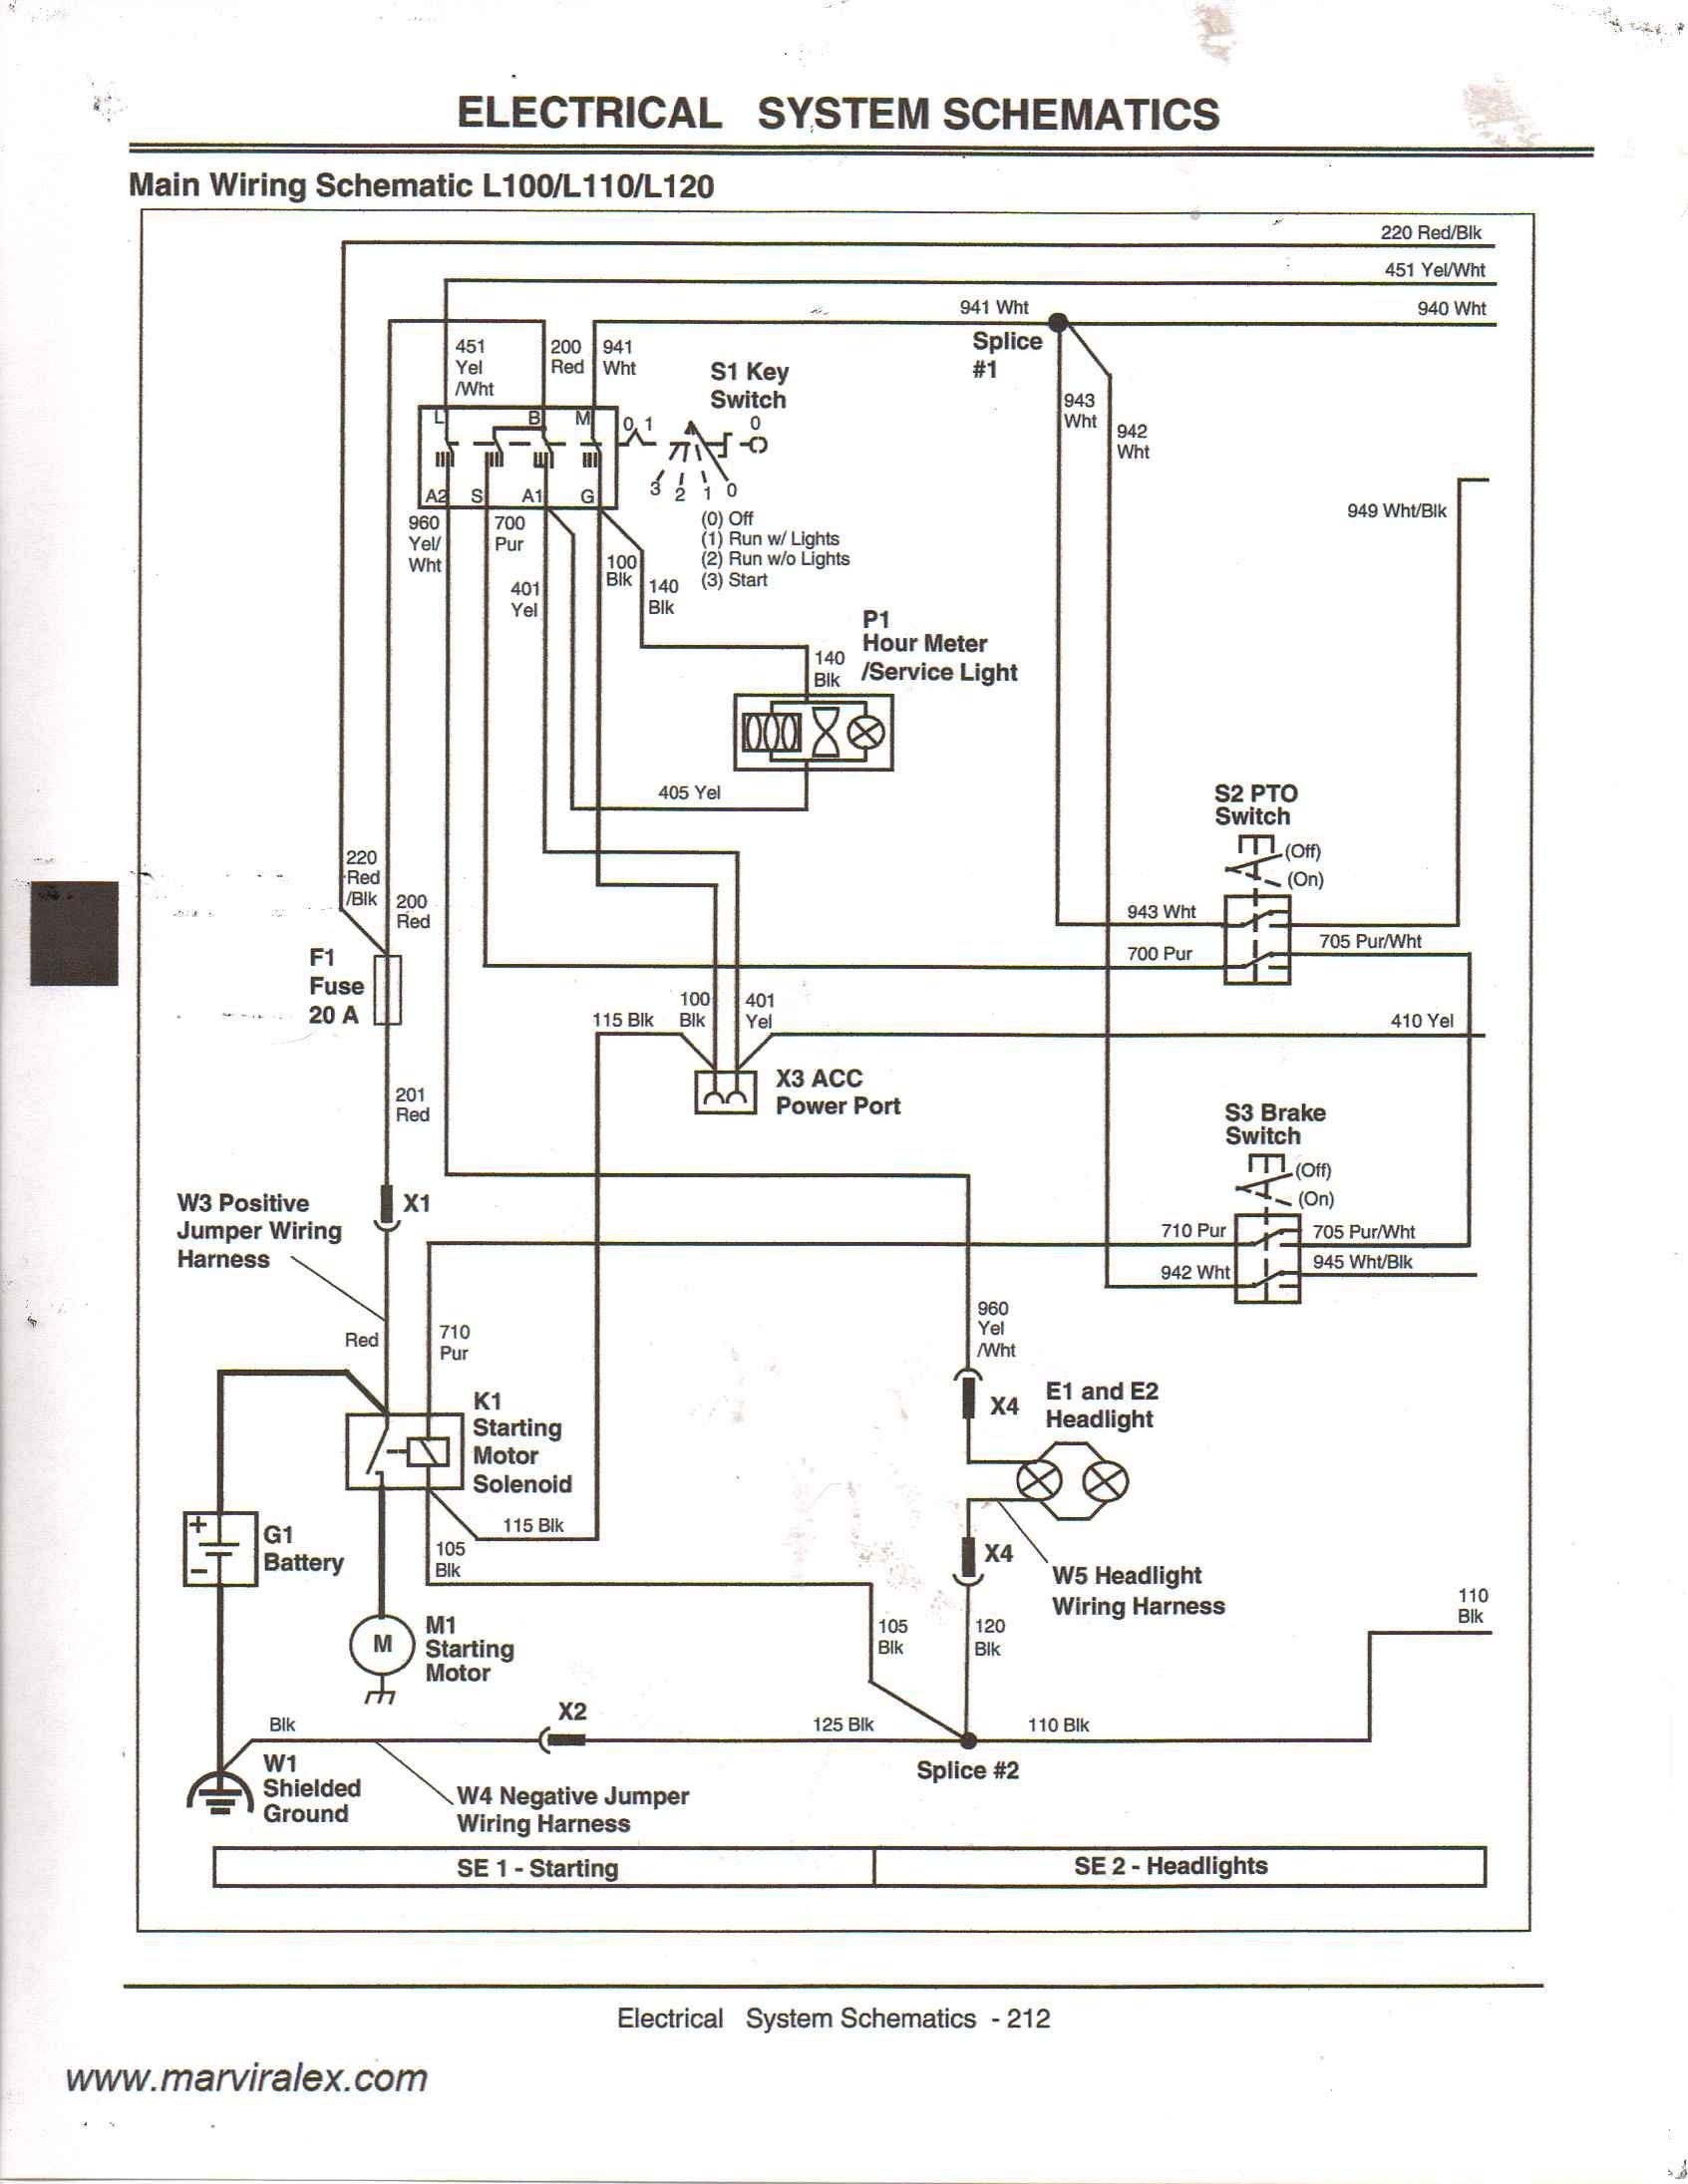 4020 Jd Wiring Diagram Cb 4290] for John Deere 1050 Tractor Wiring Diagram Of 4020 Jd Wiring Diagram